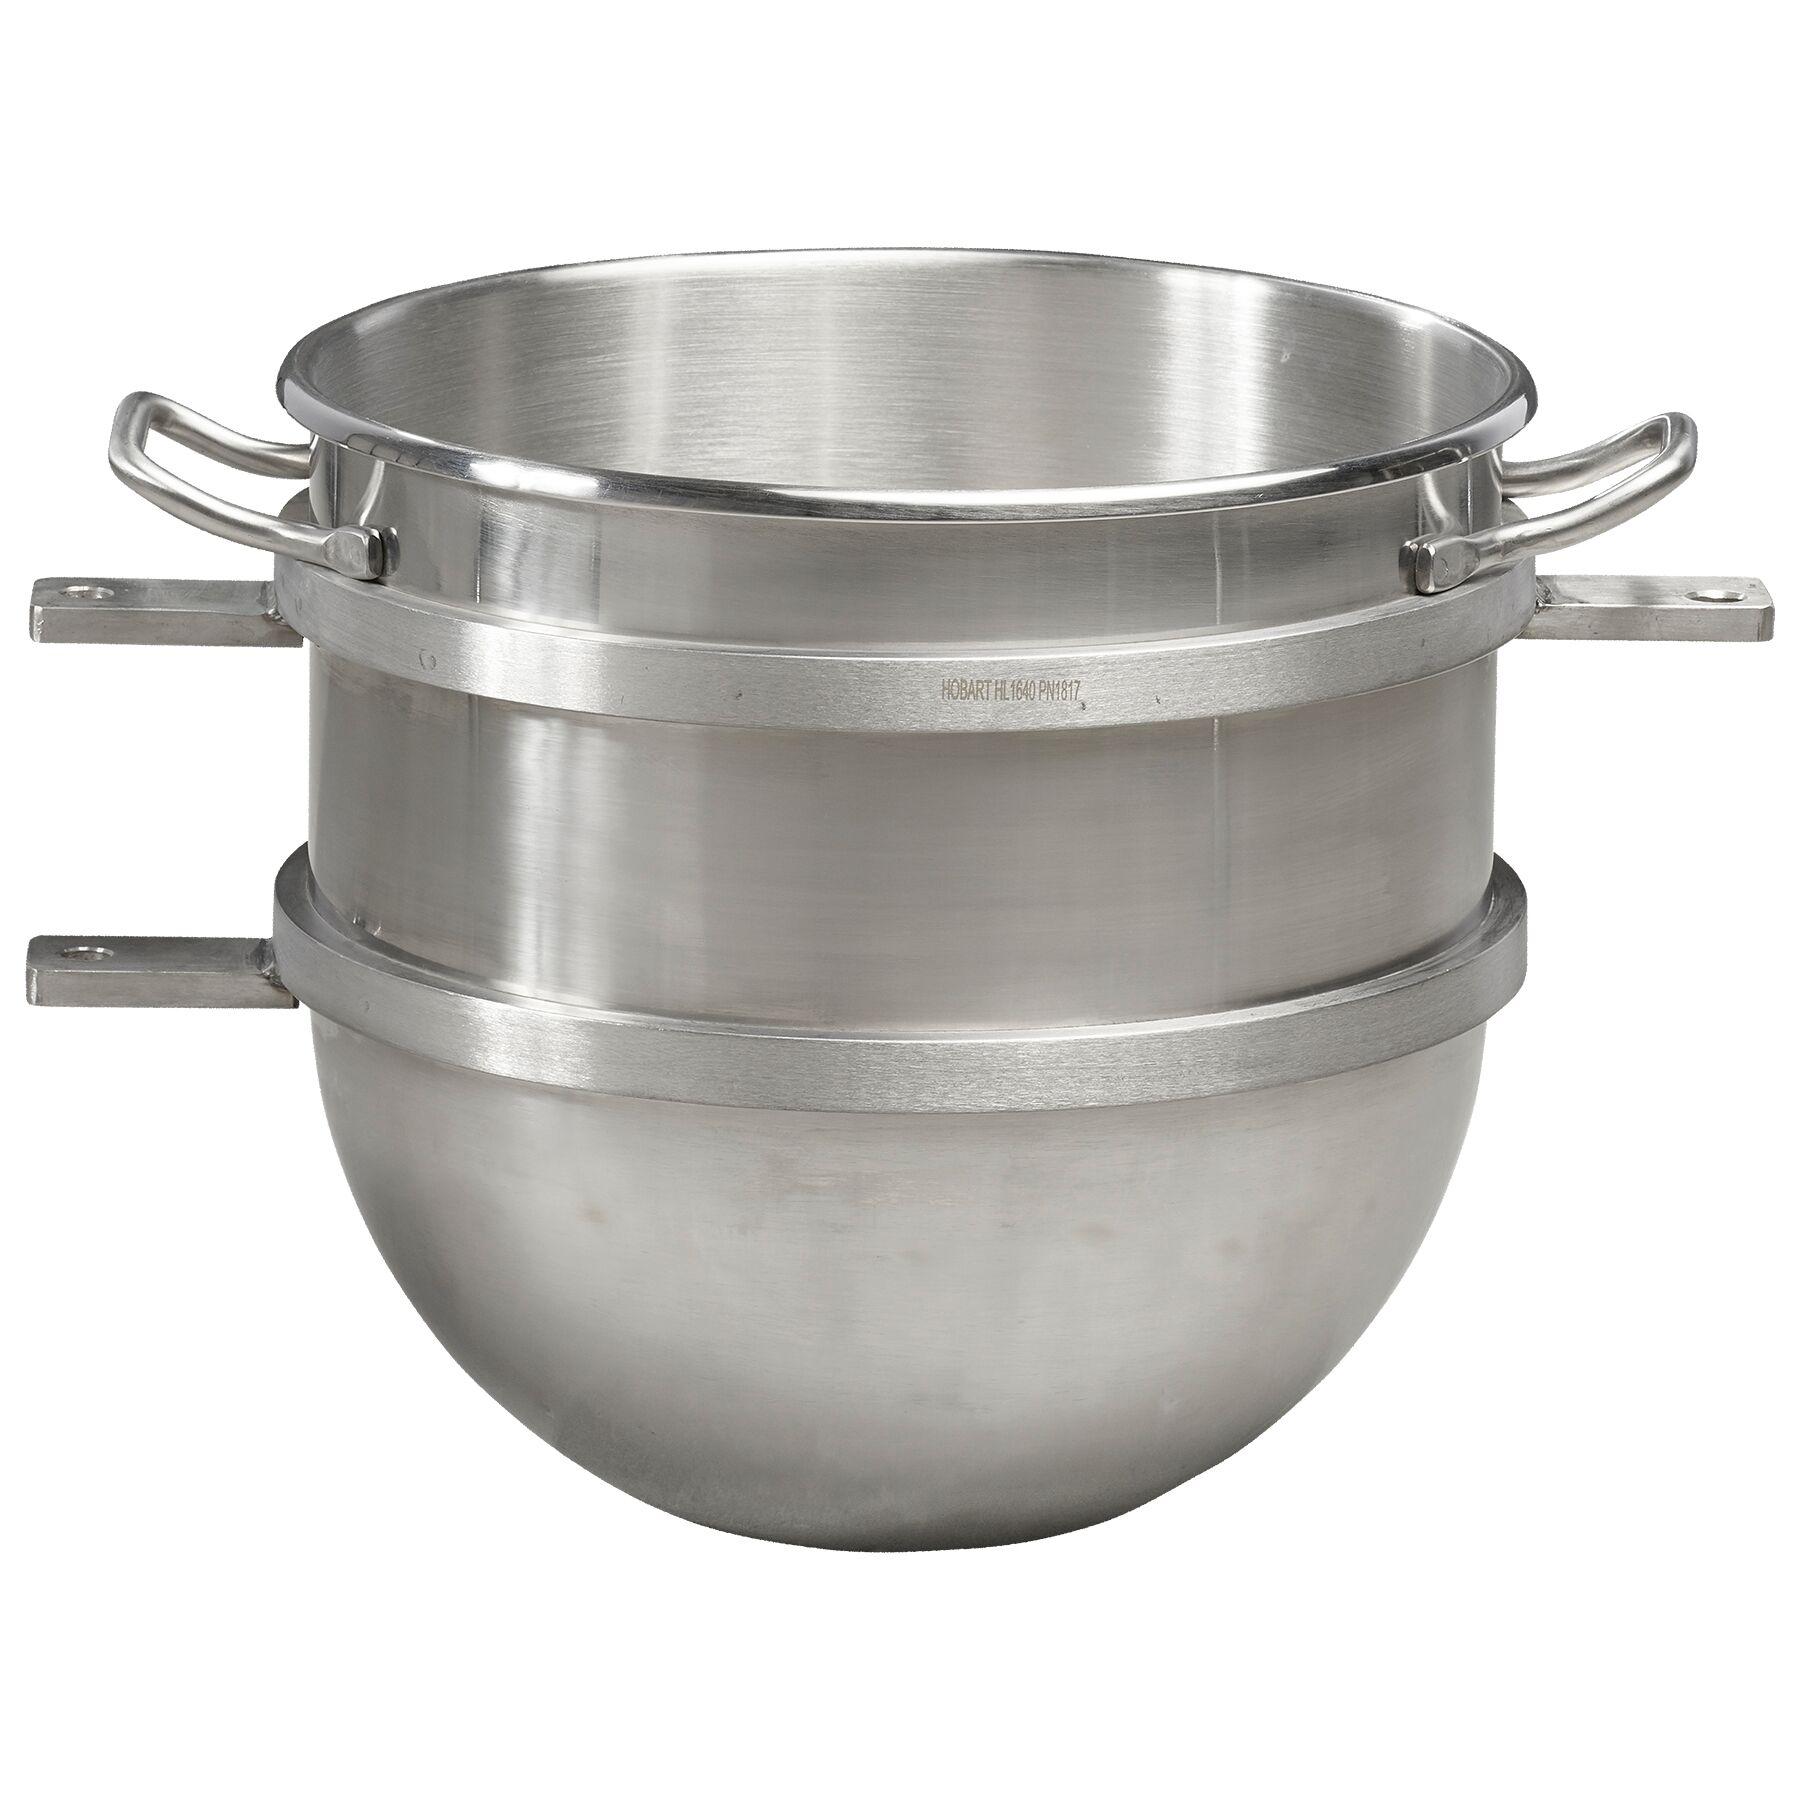 Hobart BOWL-HL20P mixer bowl